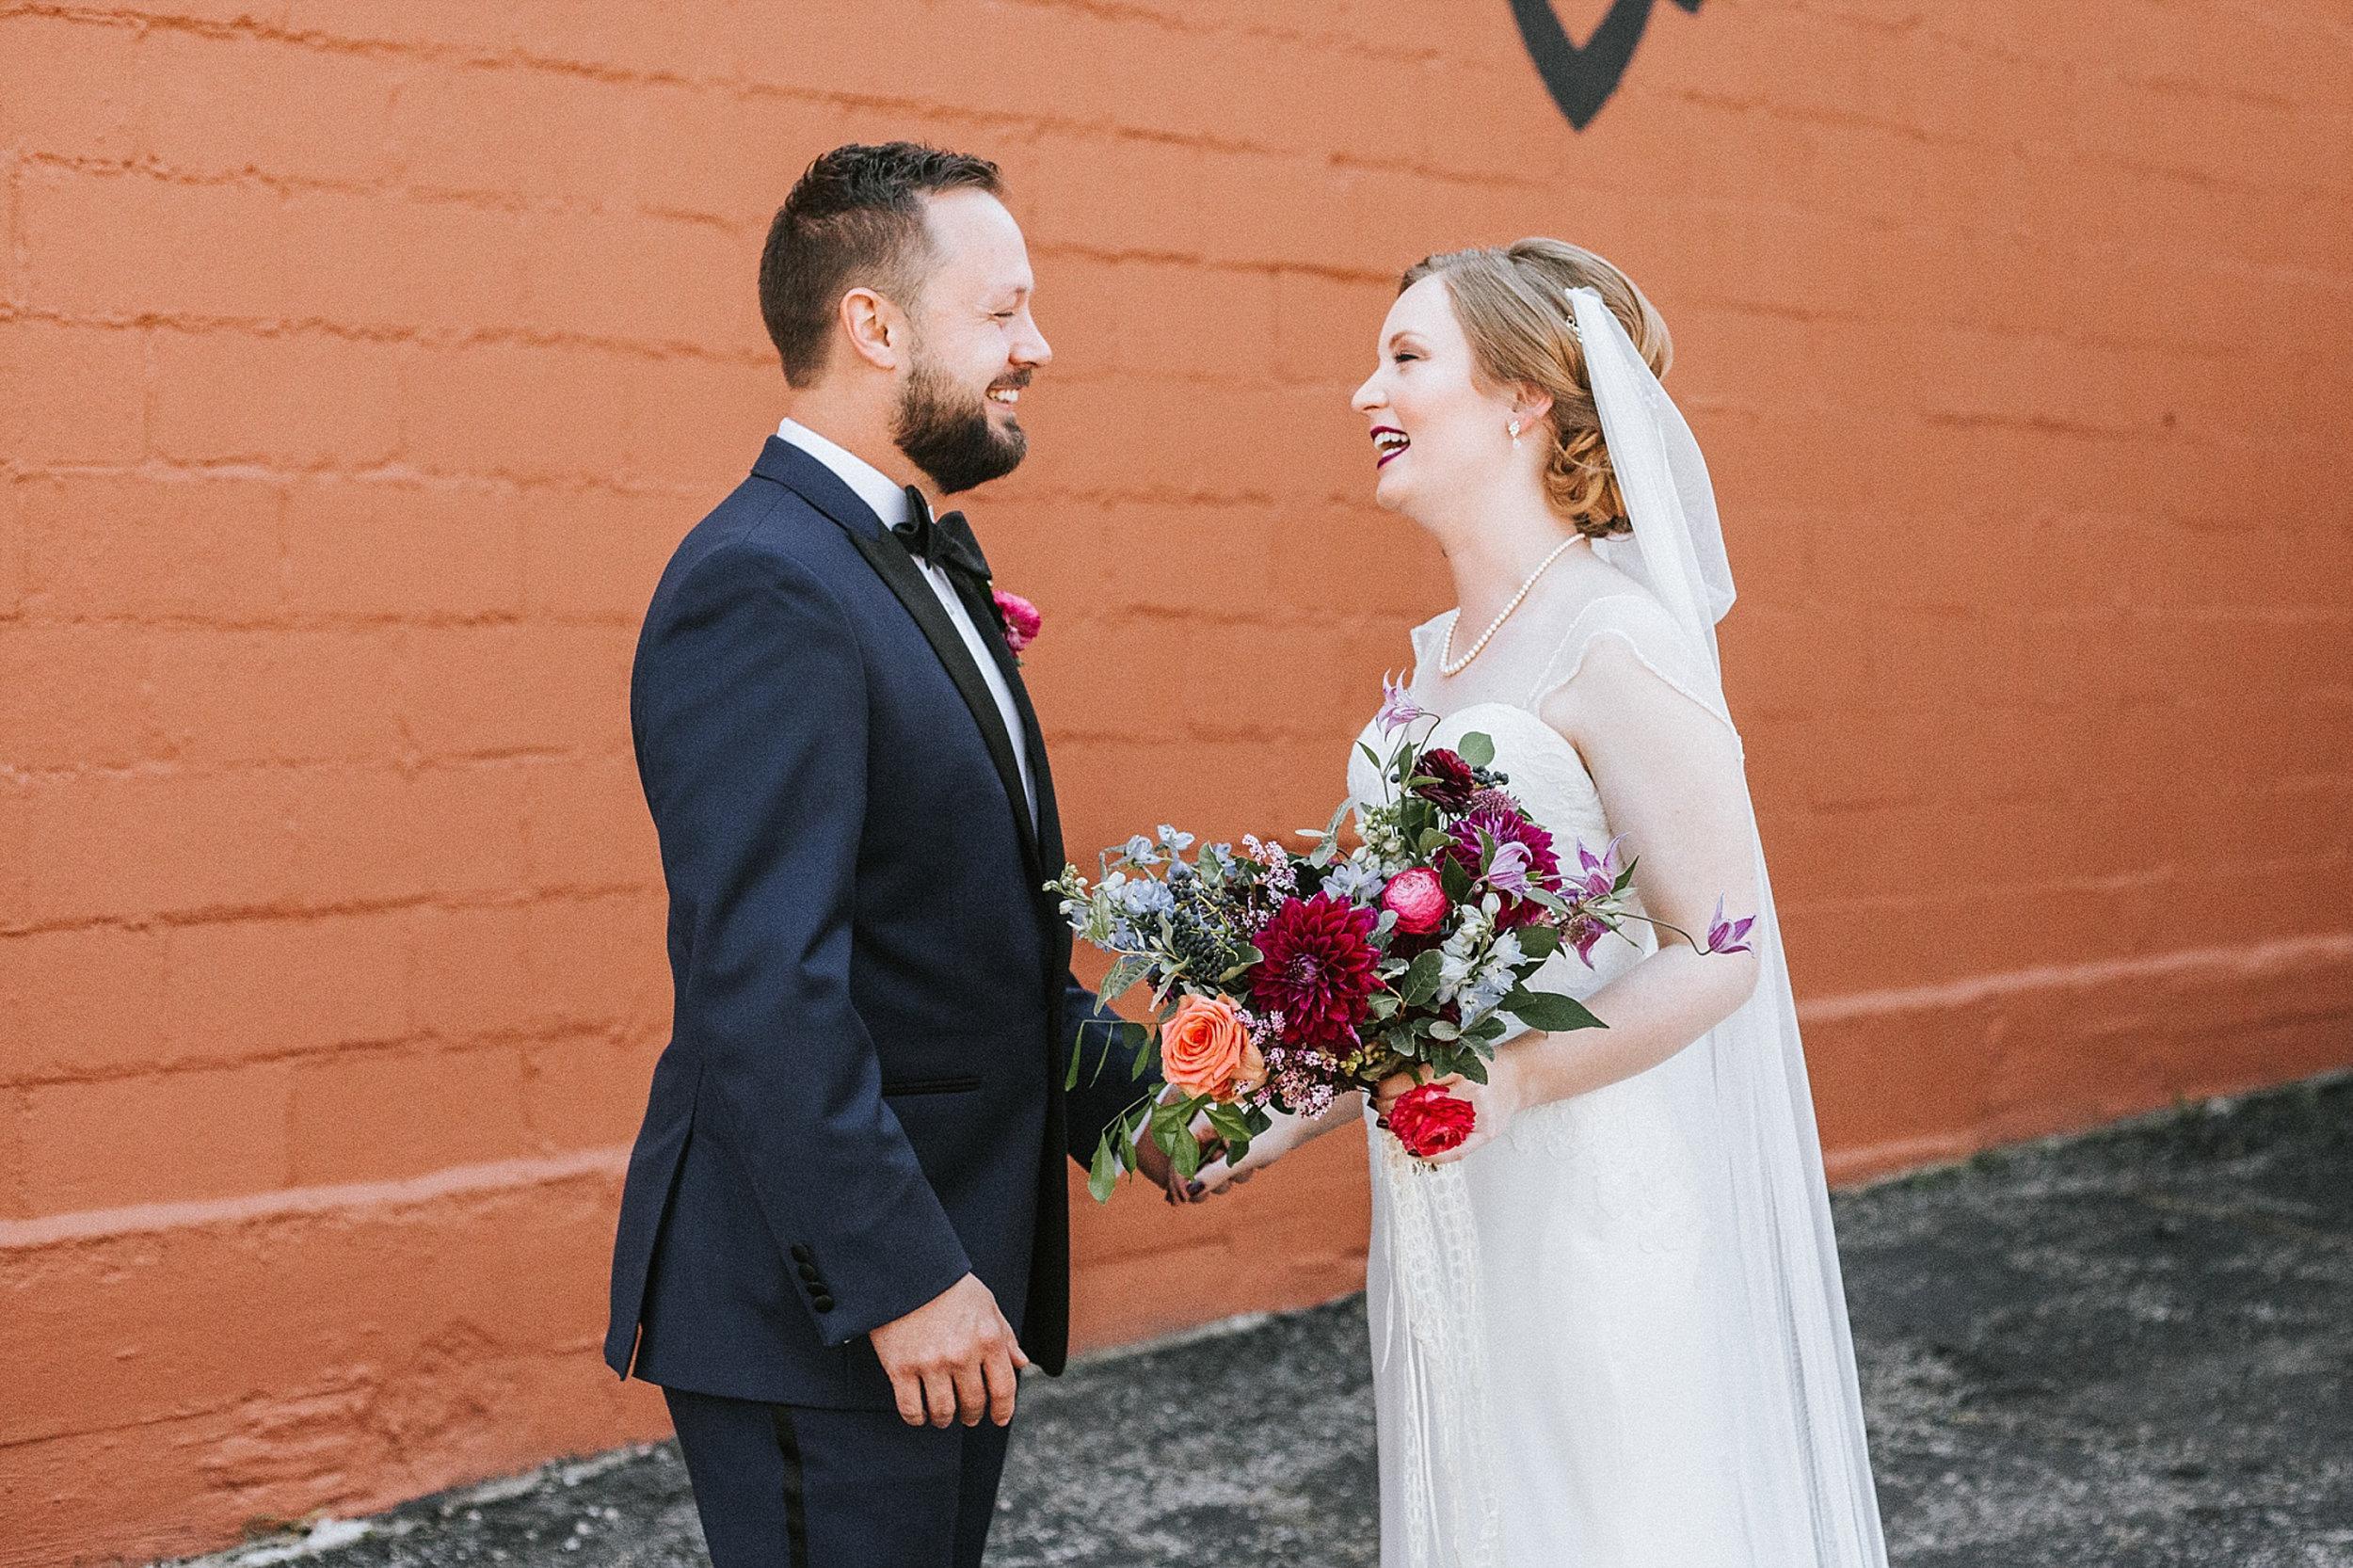 Brooke Townsend Photography - Ohio Wedding Photographer-42.jpg